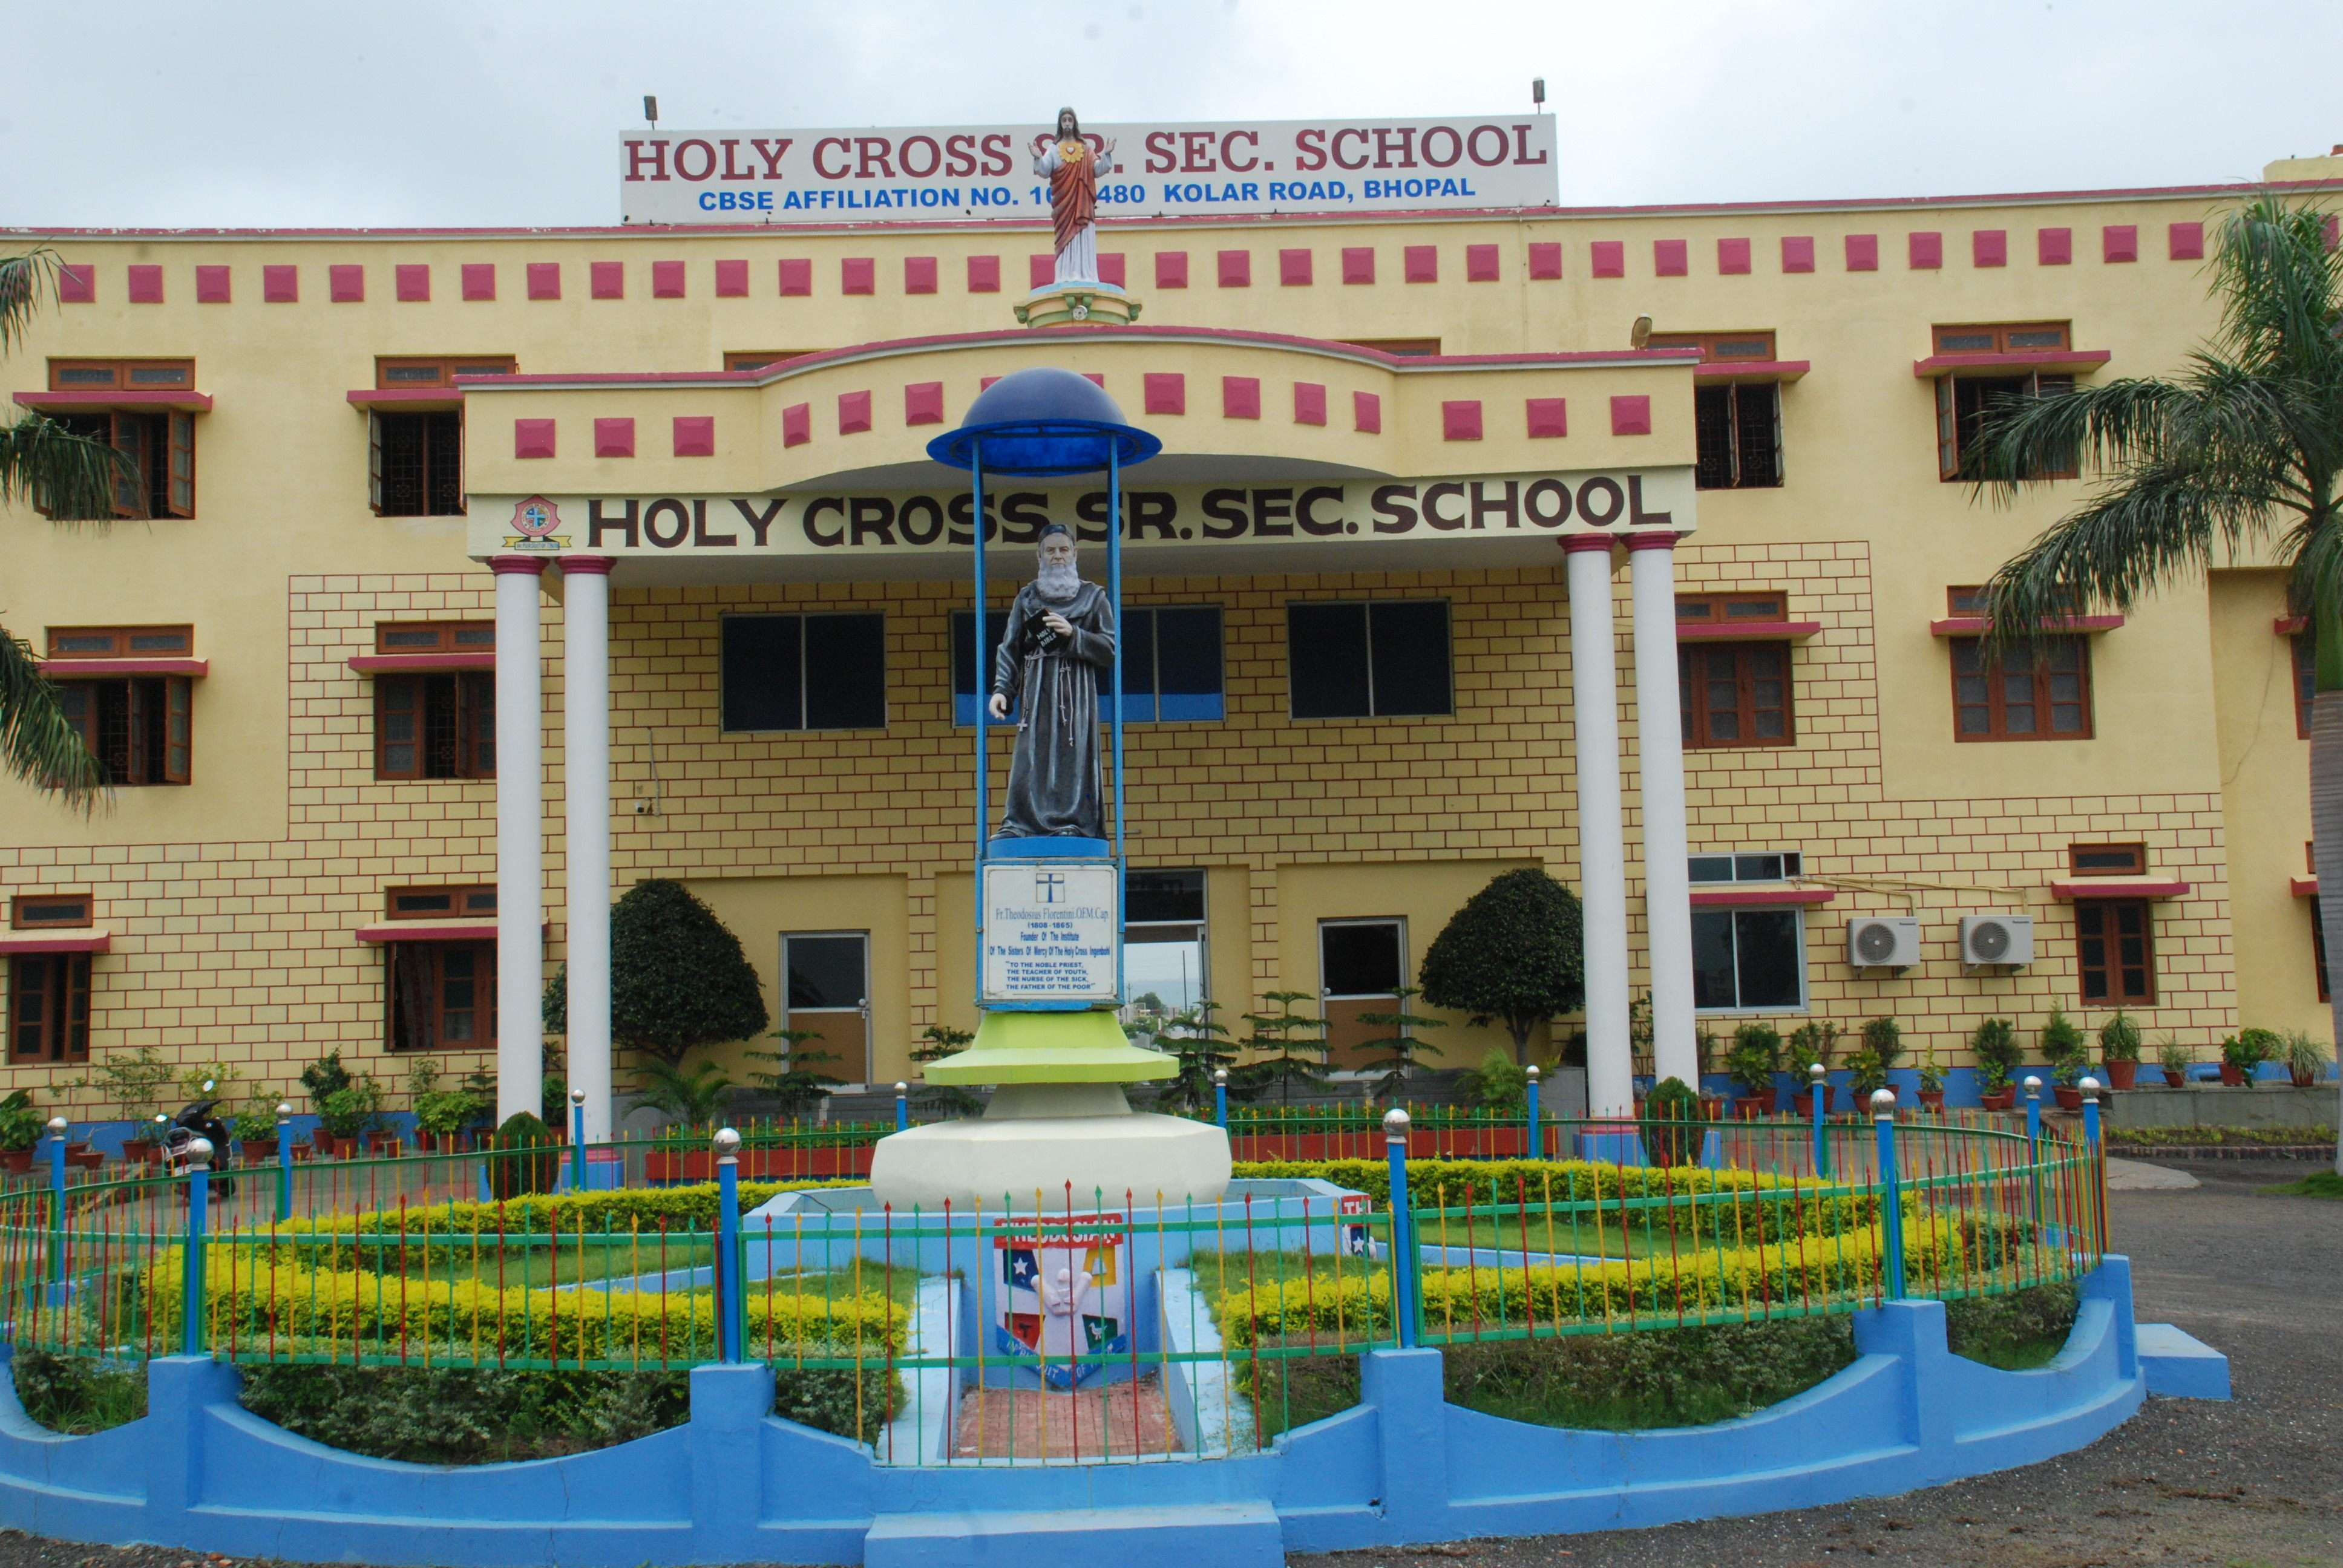 Theodosian Academy Chichli Bairagarh Kolar Road BHOPAL MADHYA PRADESH 1030480